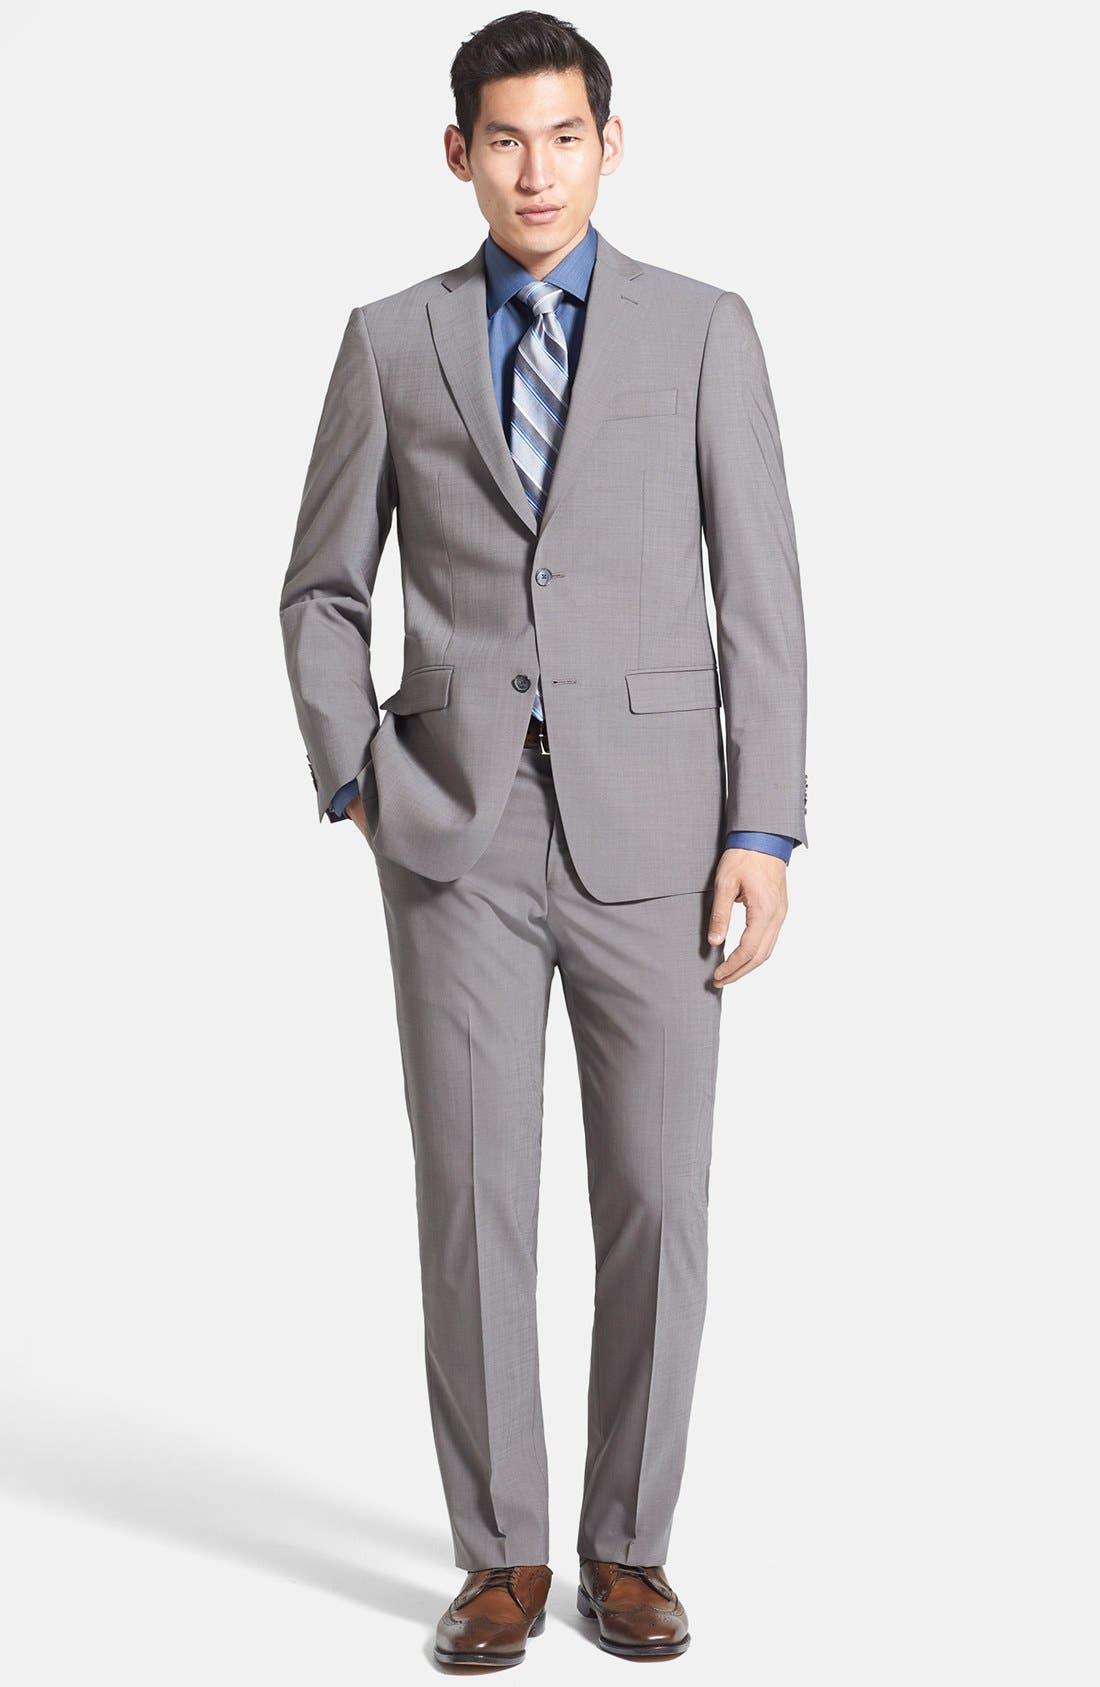 Alternate Image 1 Selected - Michael Kors Trim Fit Stretch Wool Suit